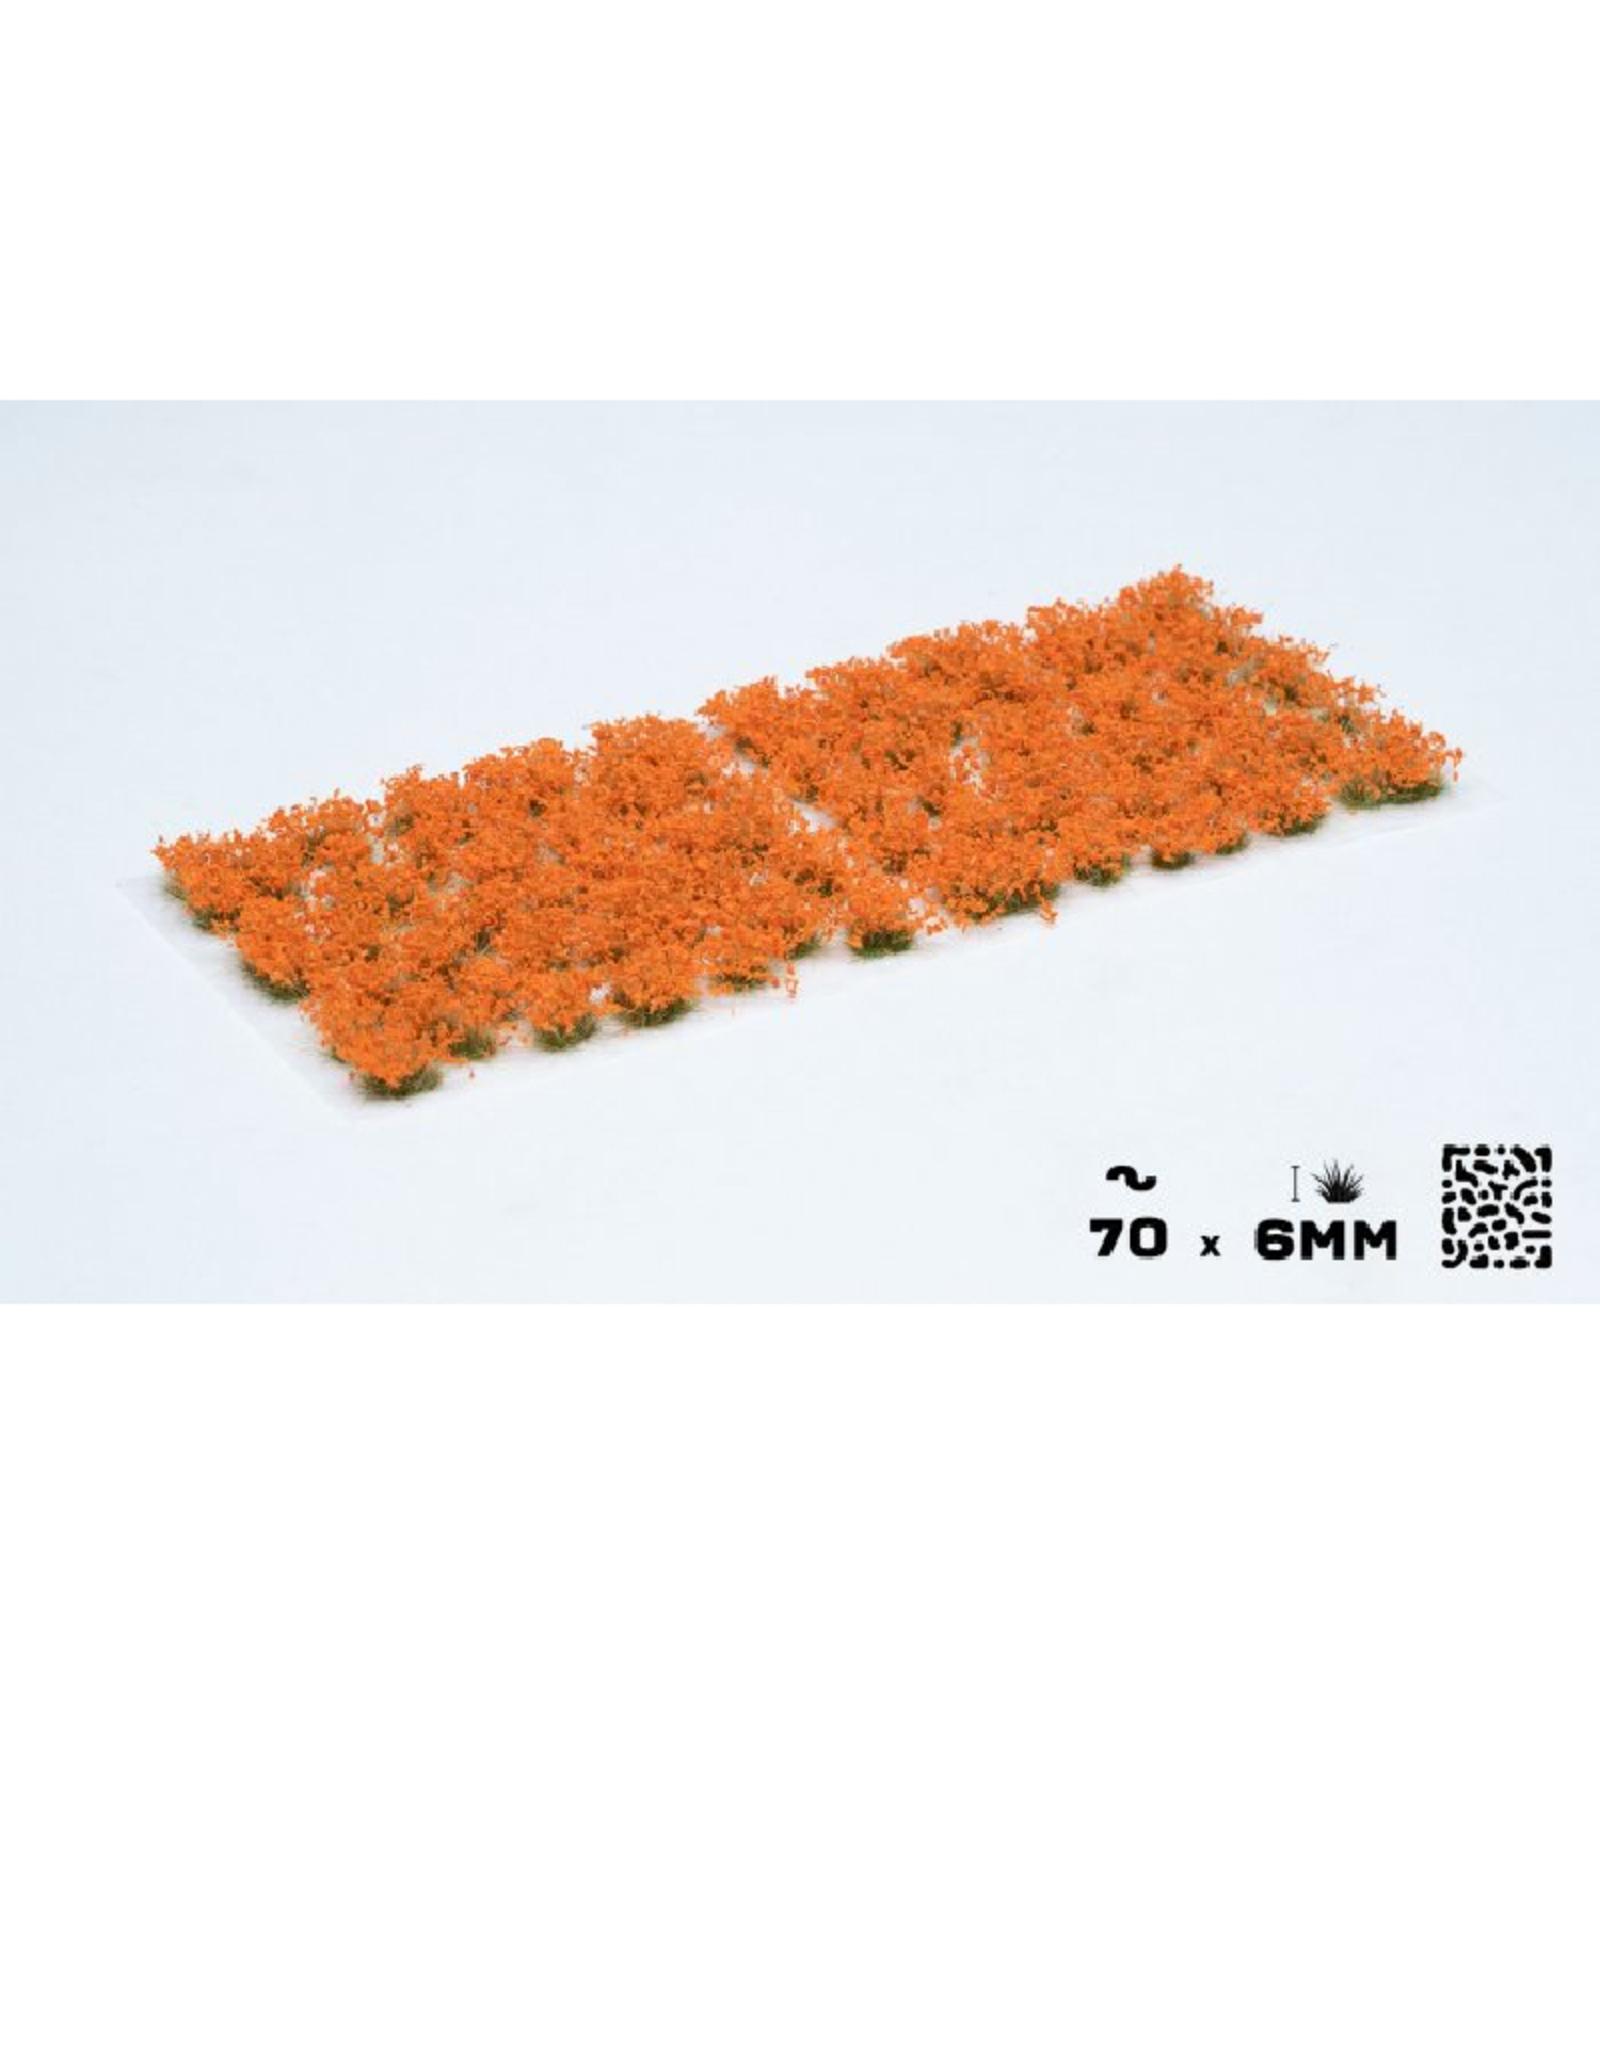 Gamers' Grass Orange Flowers